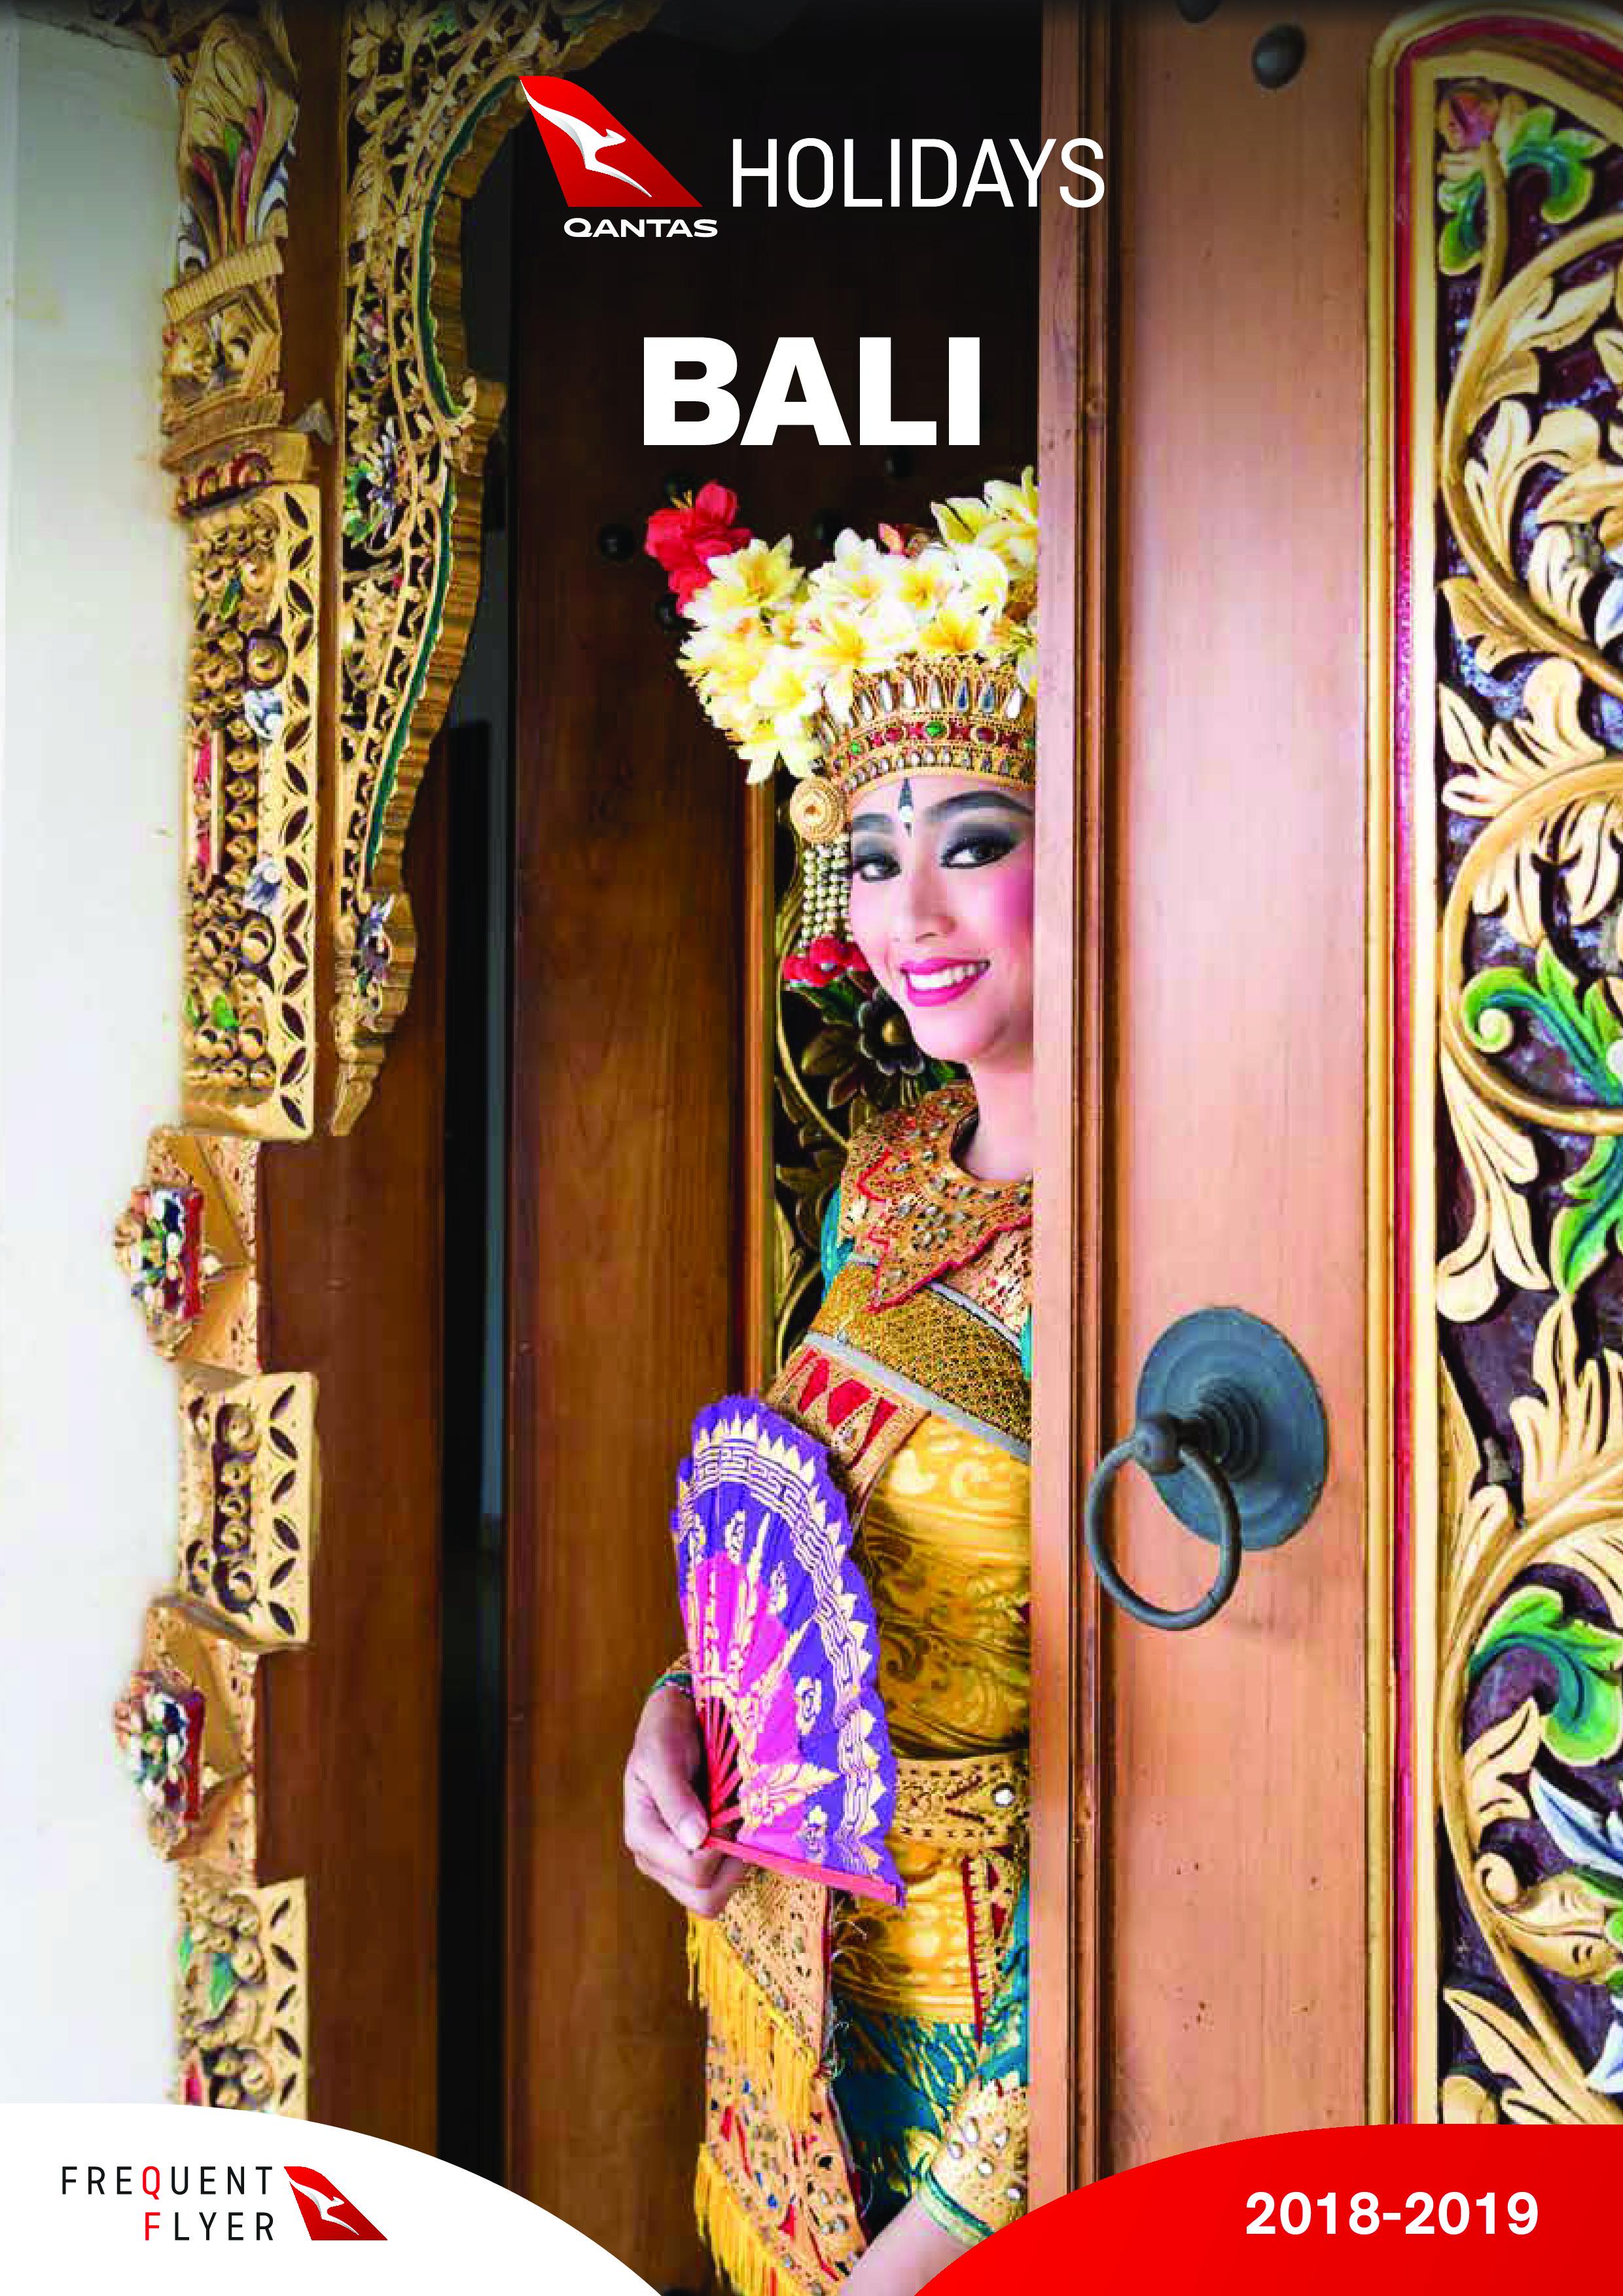 BALI-page-0.jpg